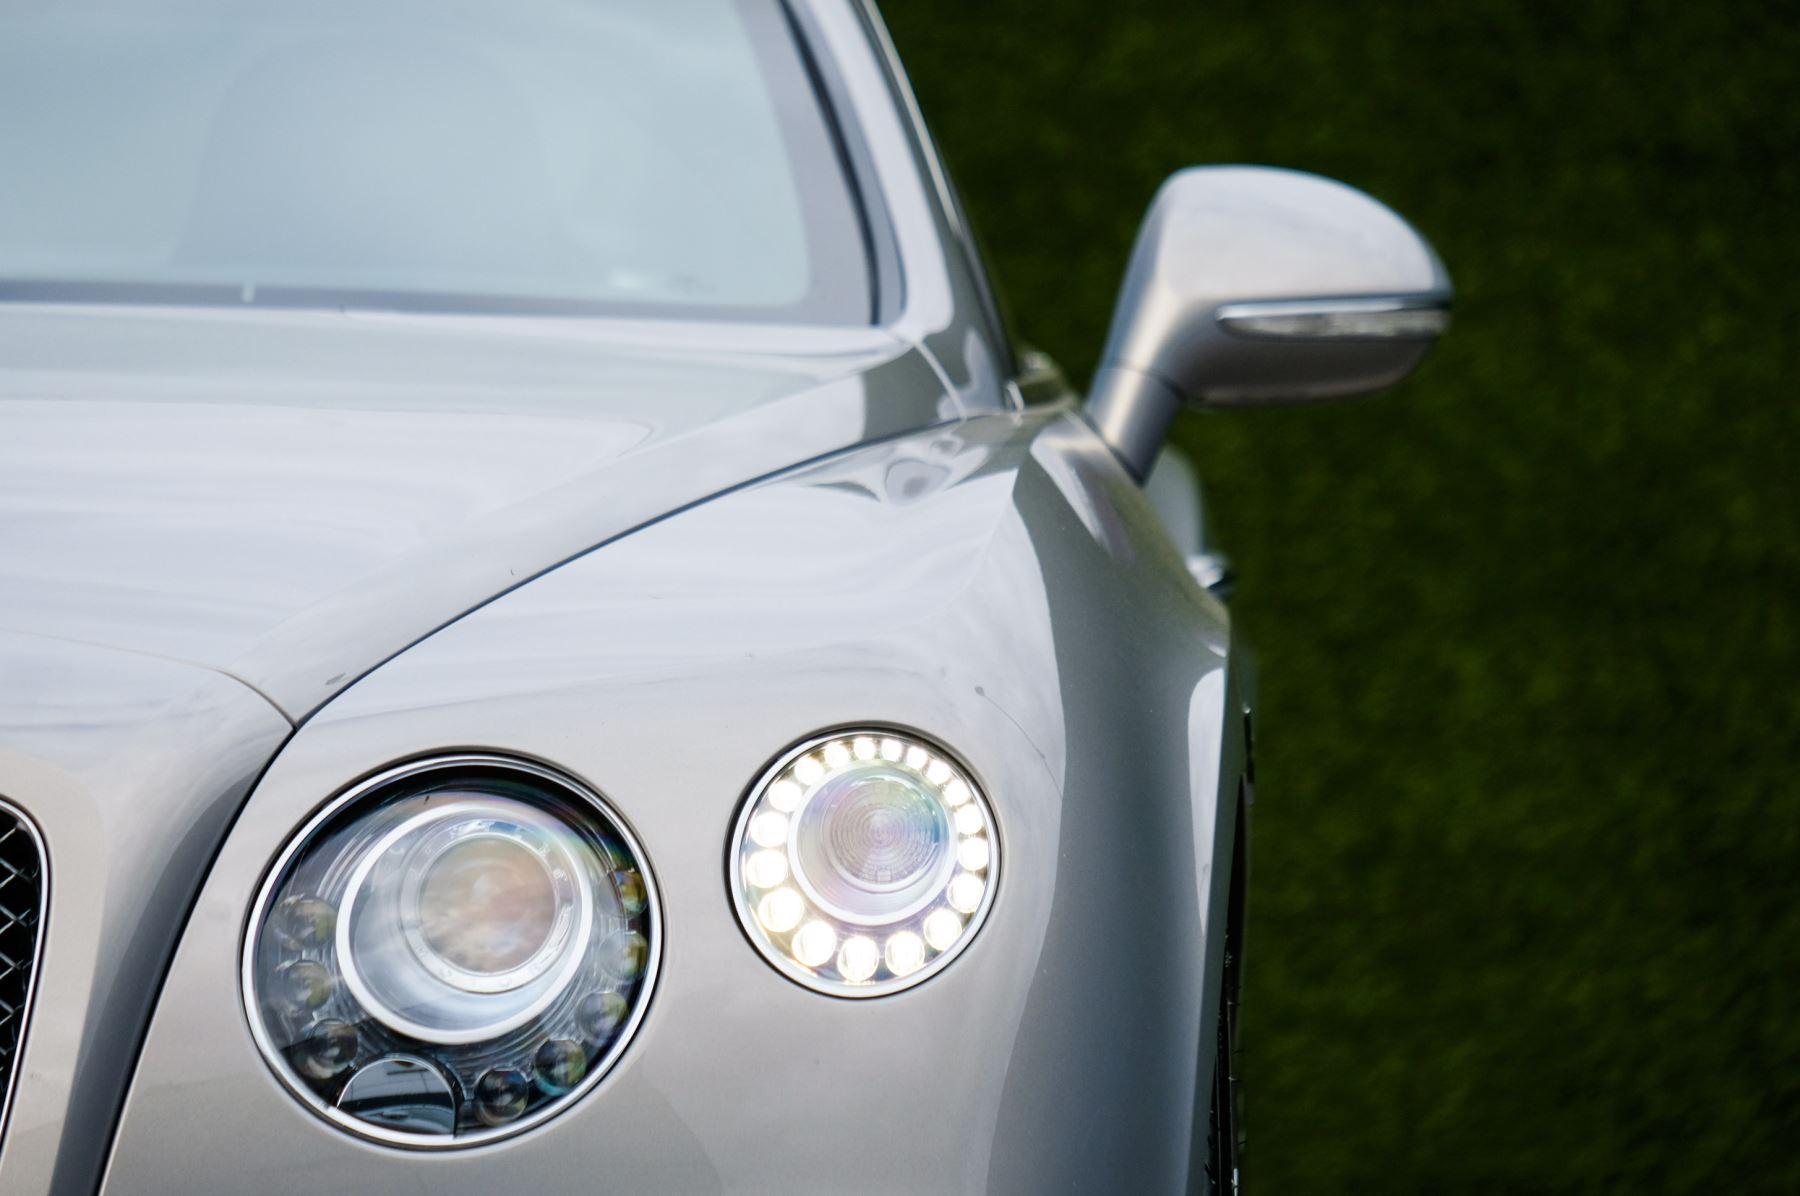 Bentley Continental GT 6.0 W12 [635] Speed - Premier Specification - Carbon Fibre Fascia Panels image 6